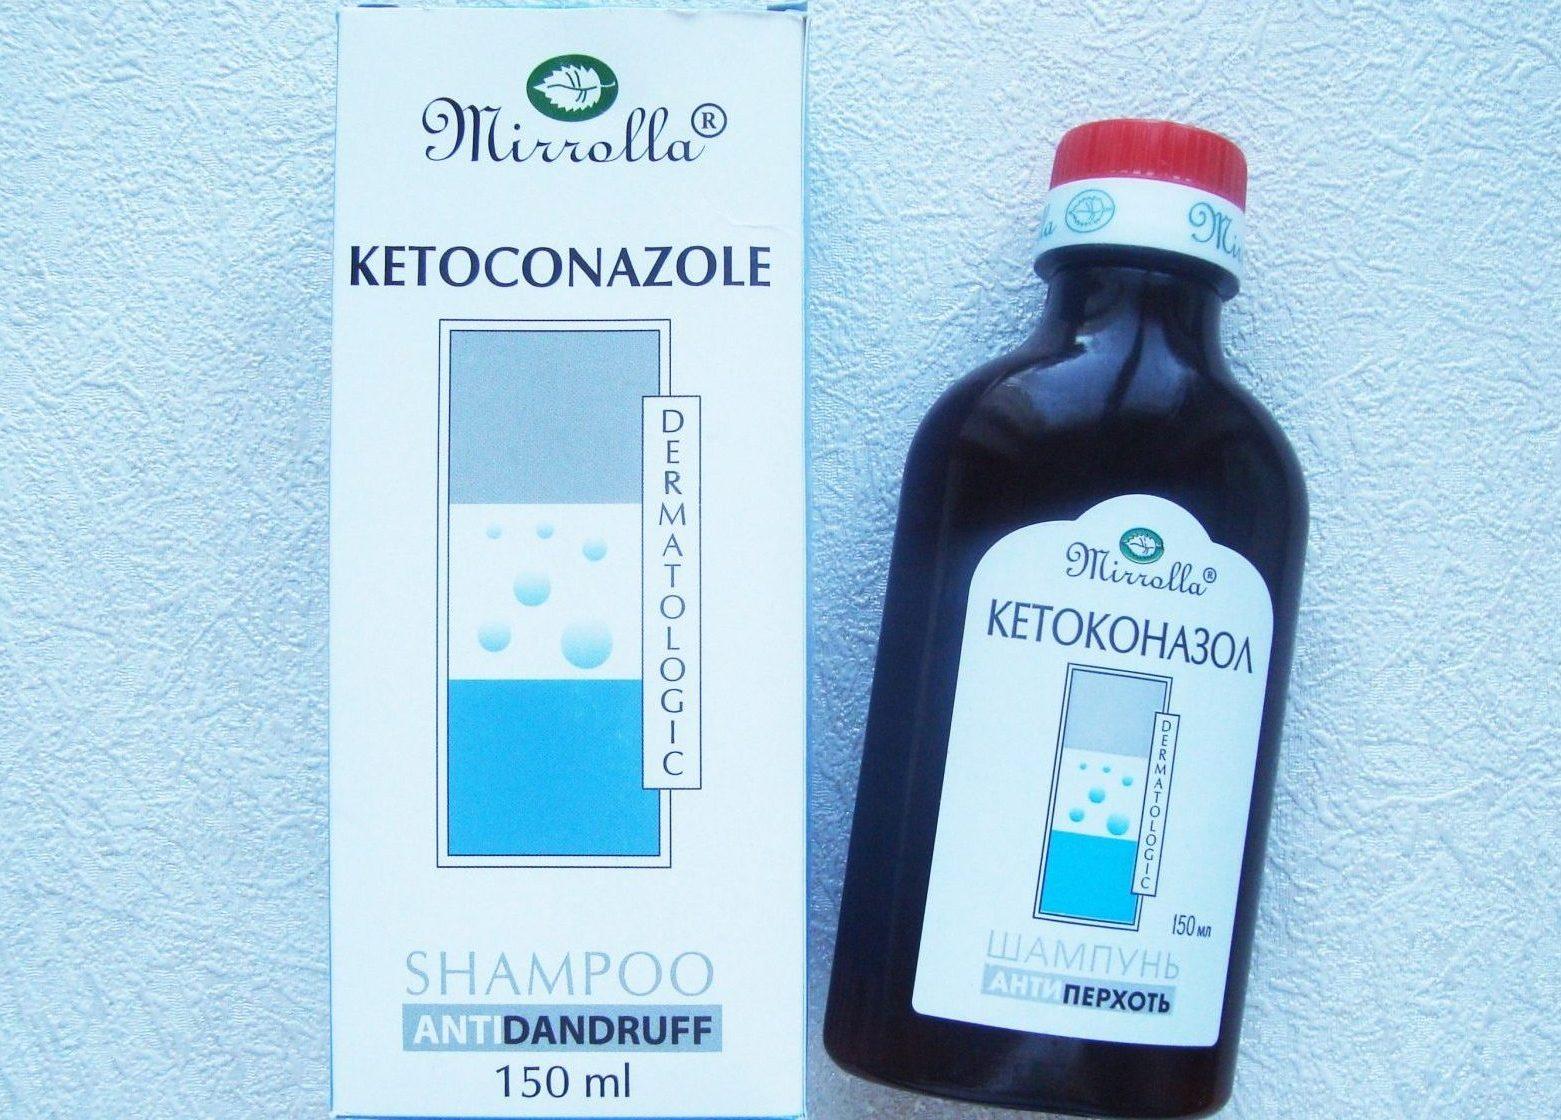 Mirrolla-ketonazol-2